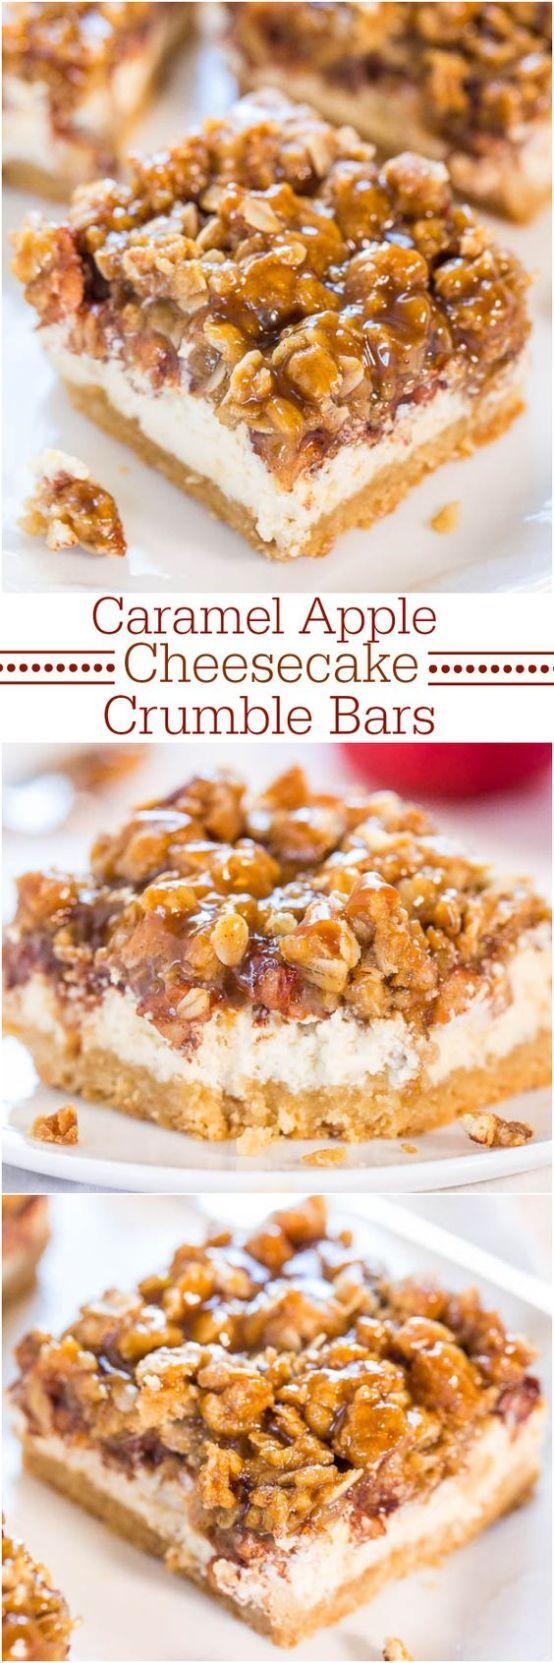 Easy caramel apple cheesecake recipes